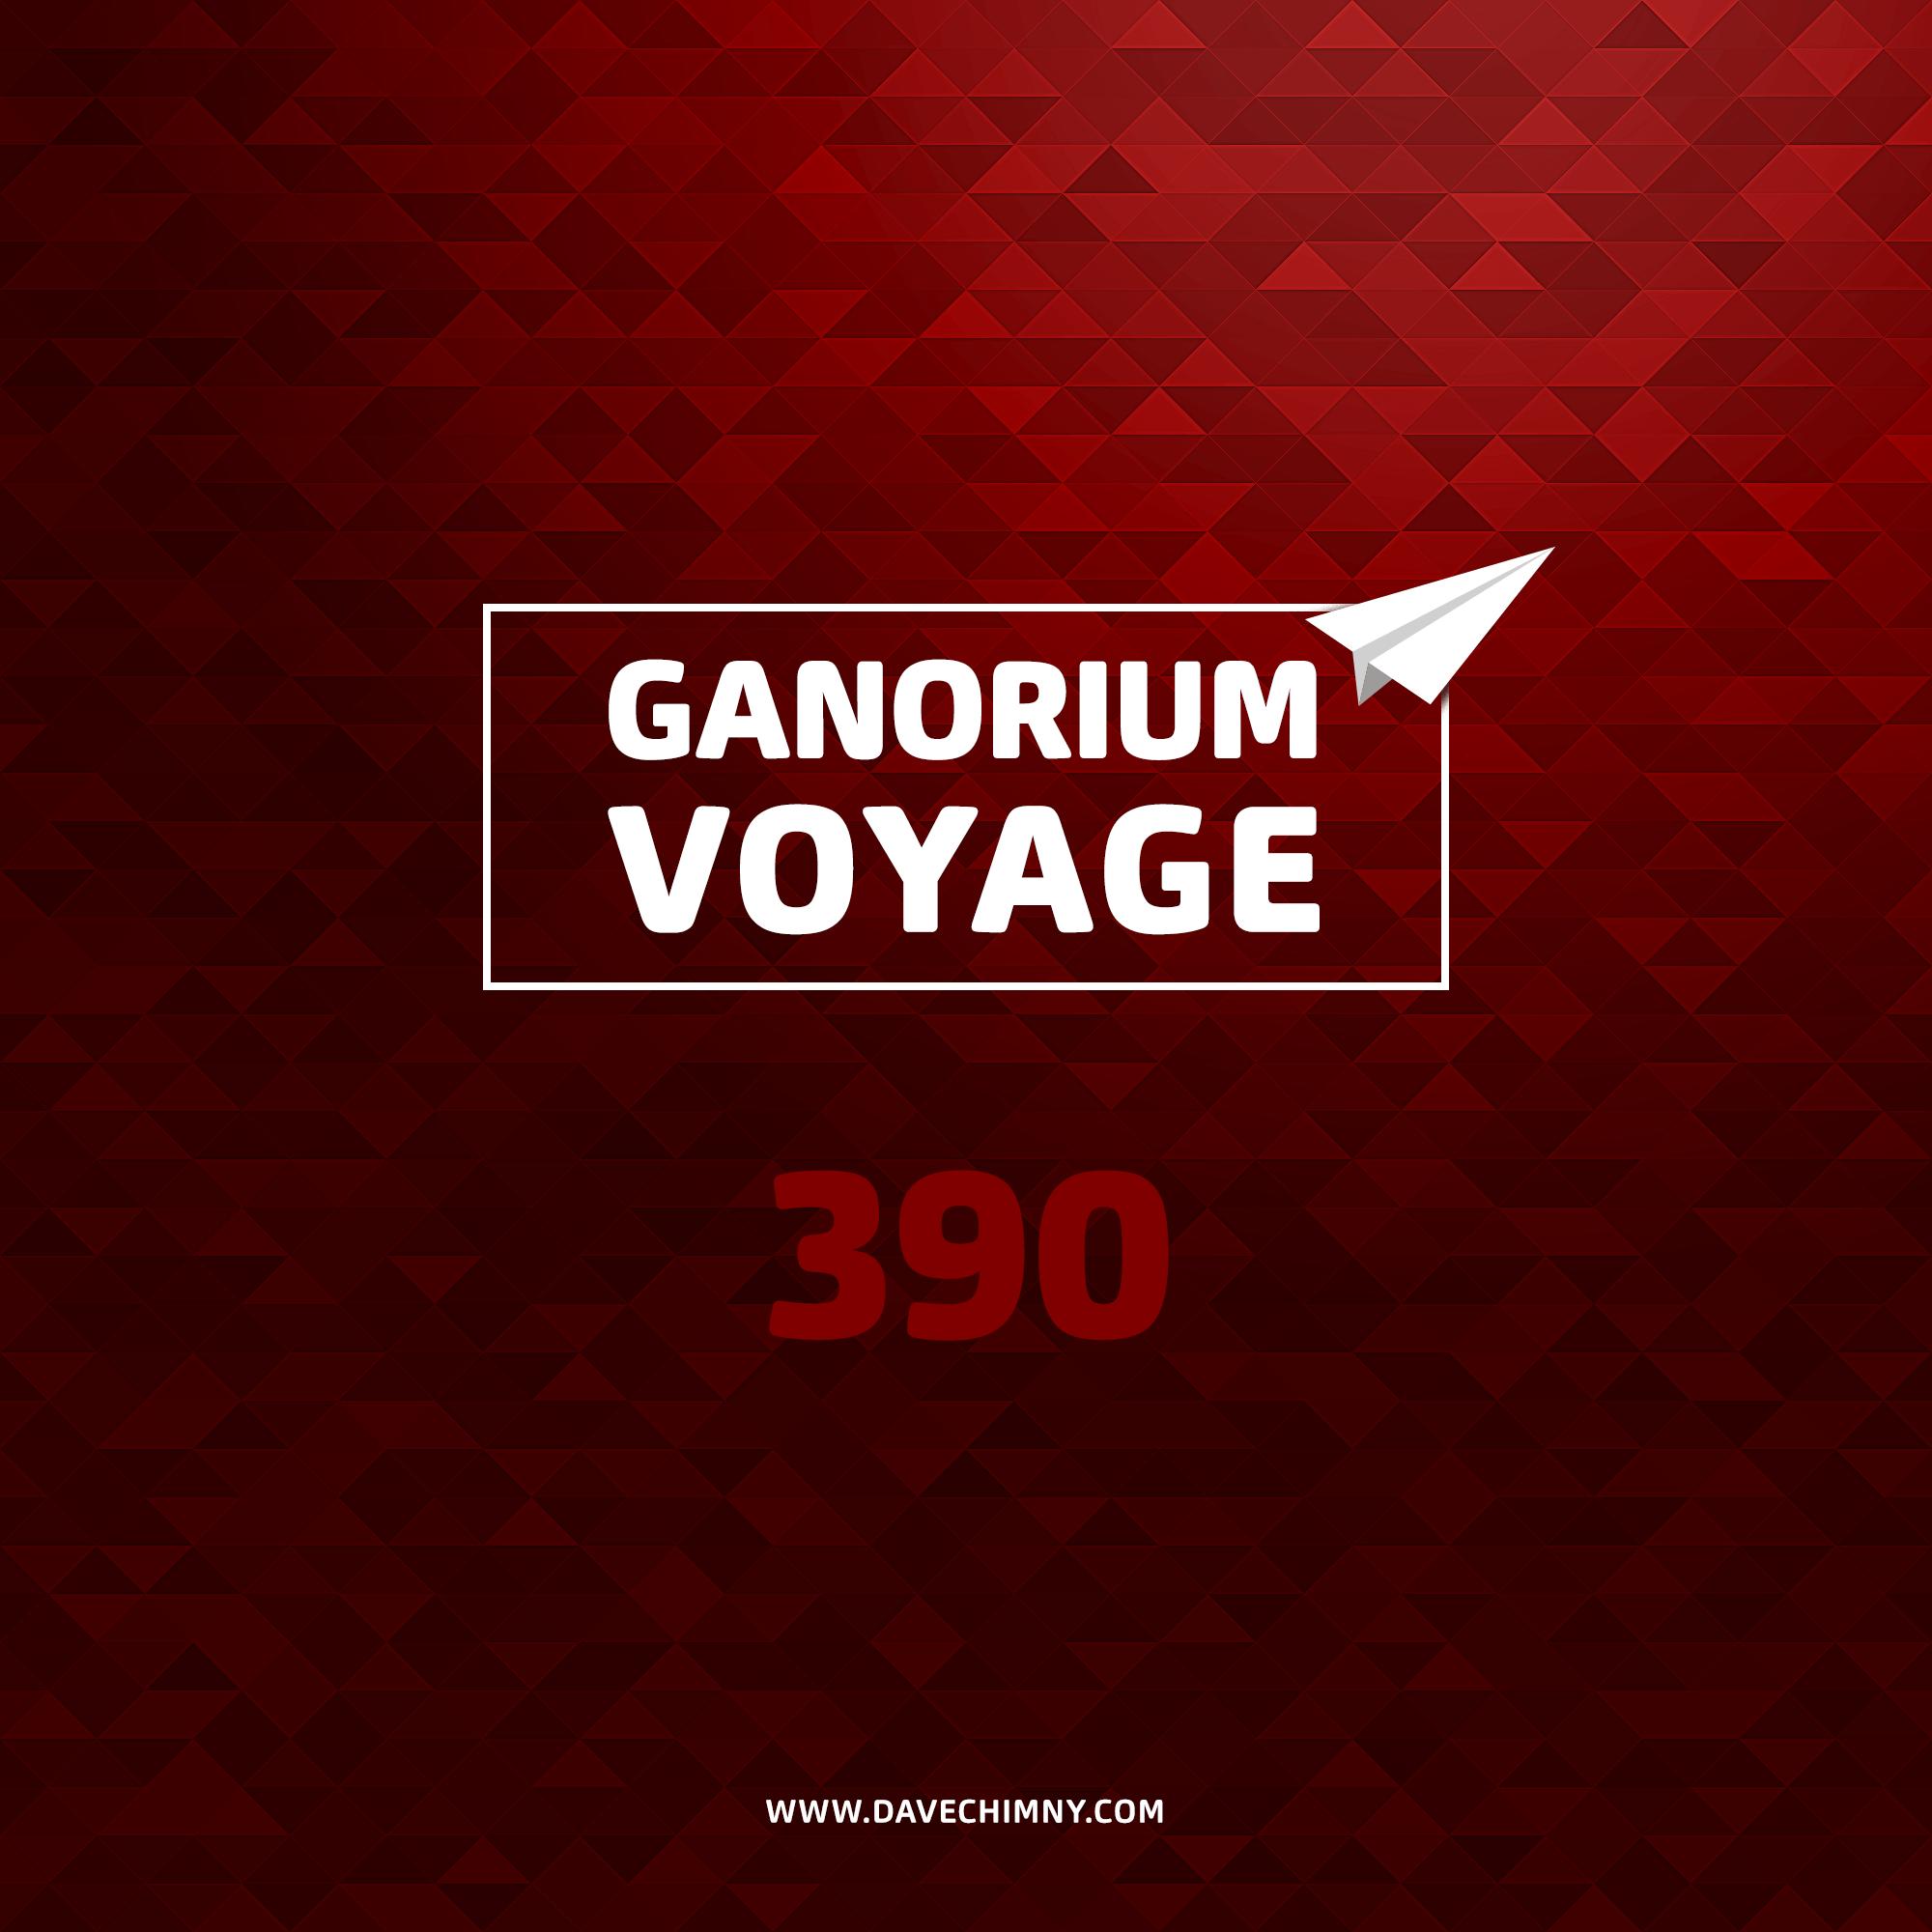 Dave Chimny – Ganorium Voyage 390